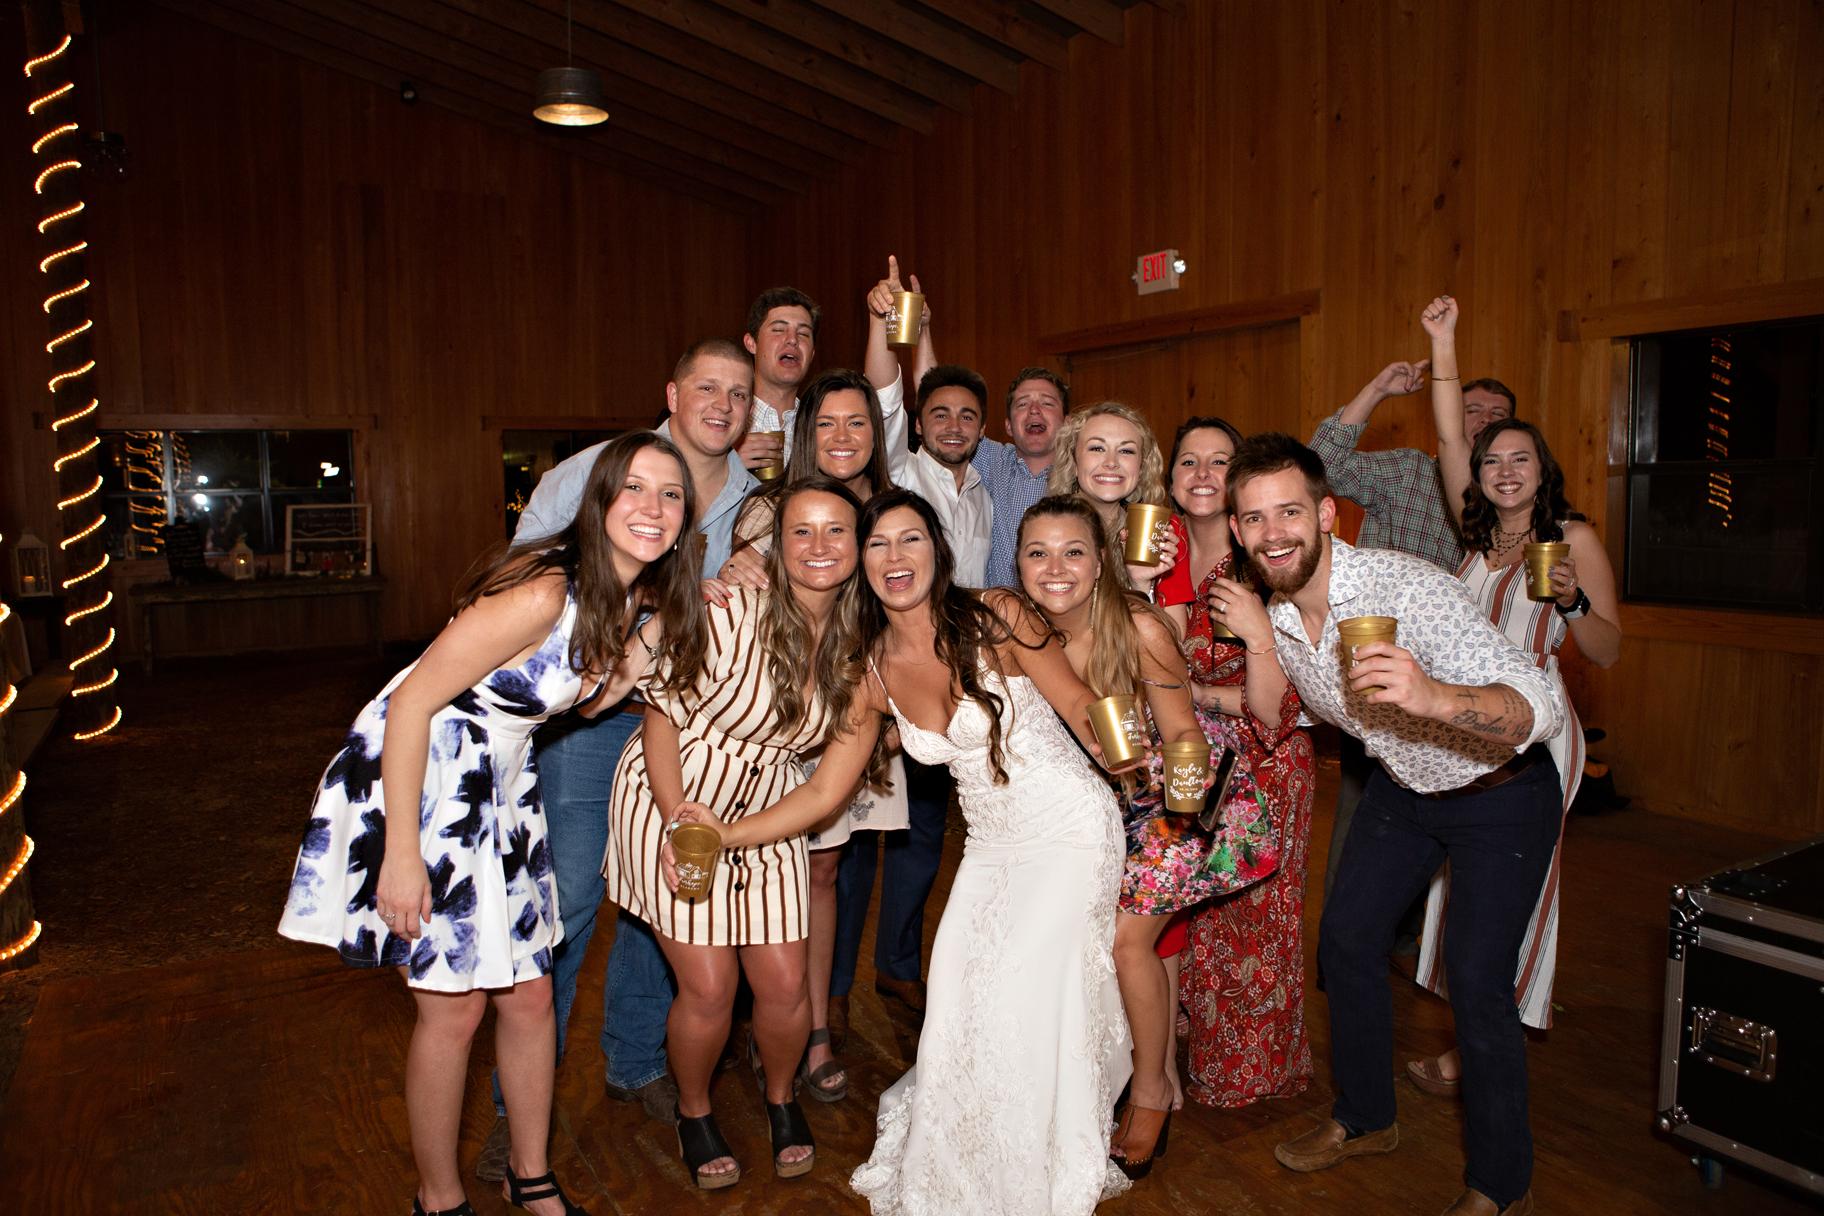 Fairhope-Alabama-Wedding-Photographers-Nick-Drollette-Photography-159.jpg